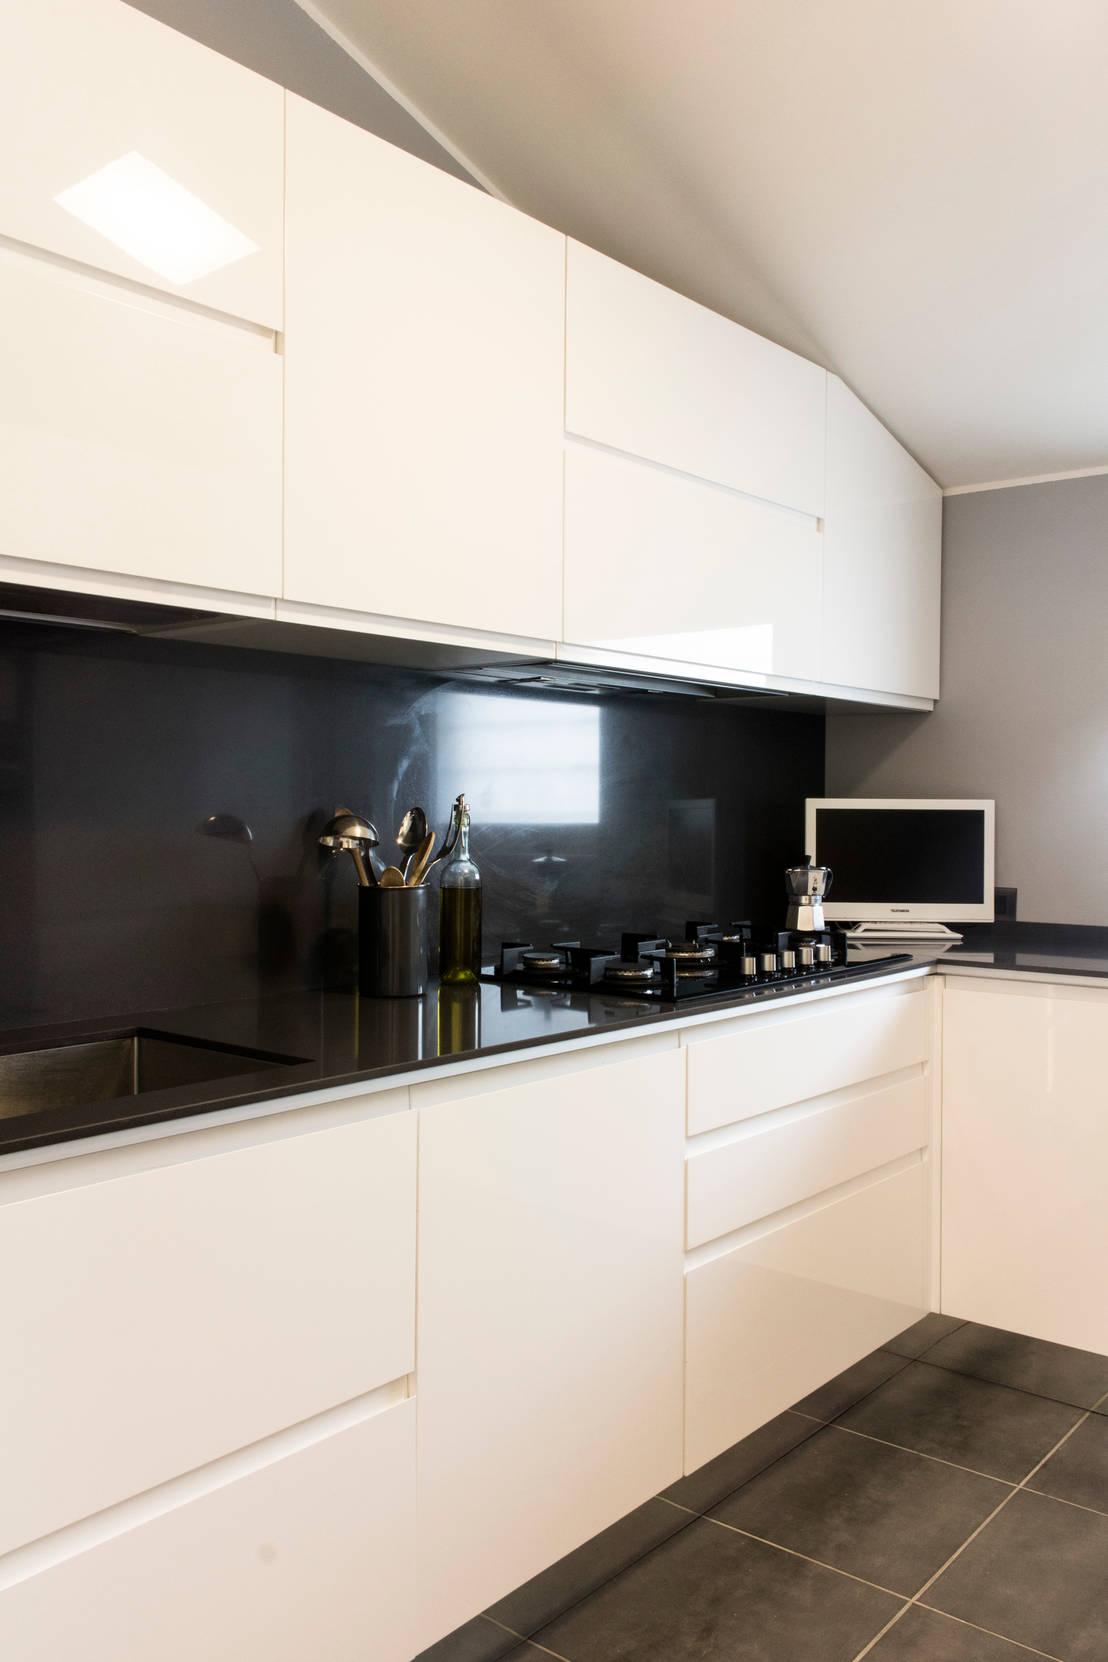 Cucina in bianco e nero - Rivestimento cucina bianco ...